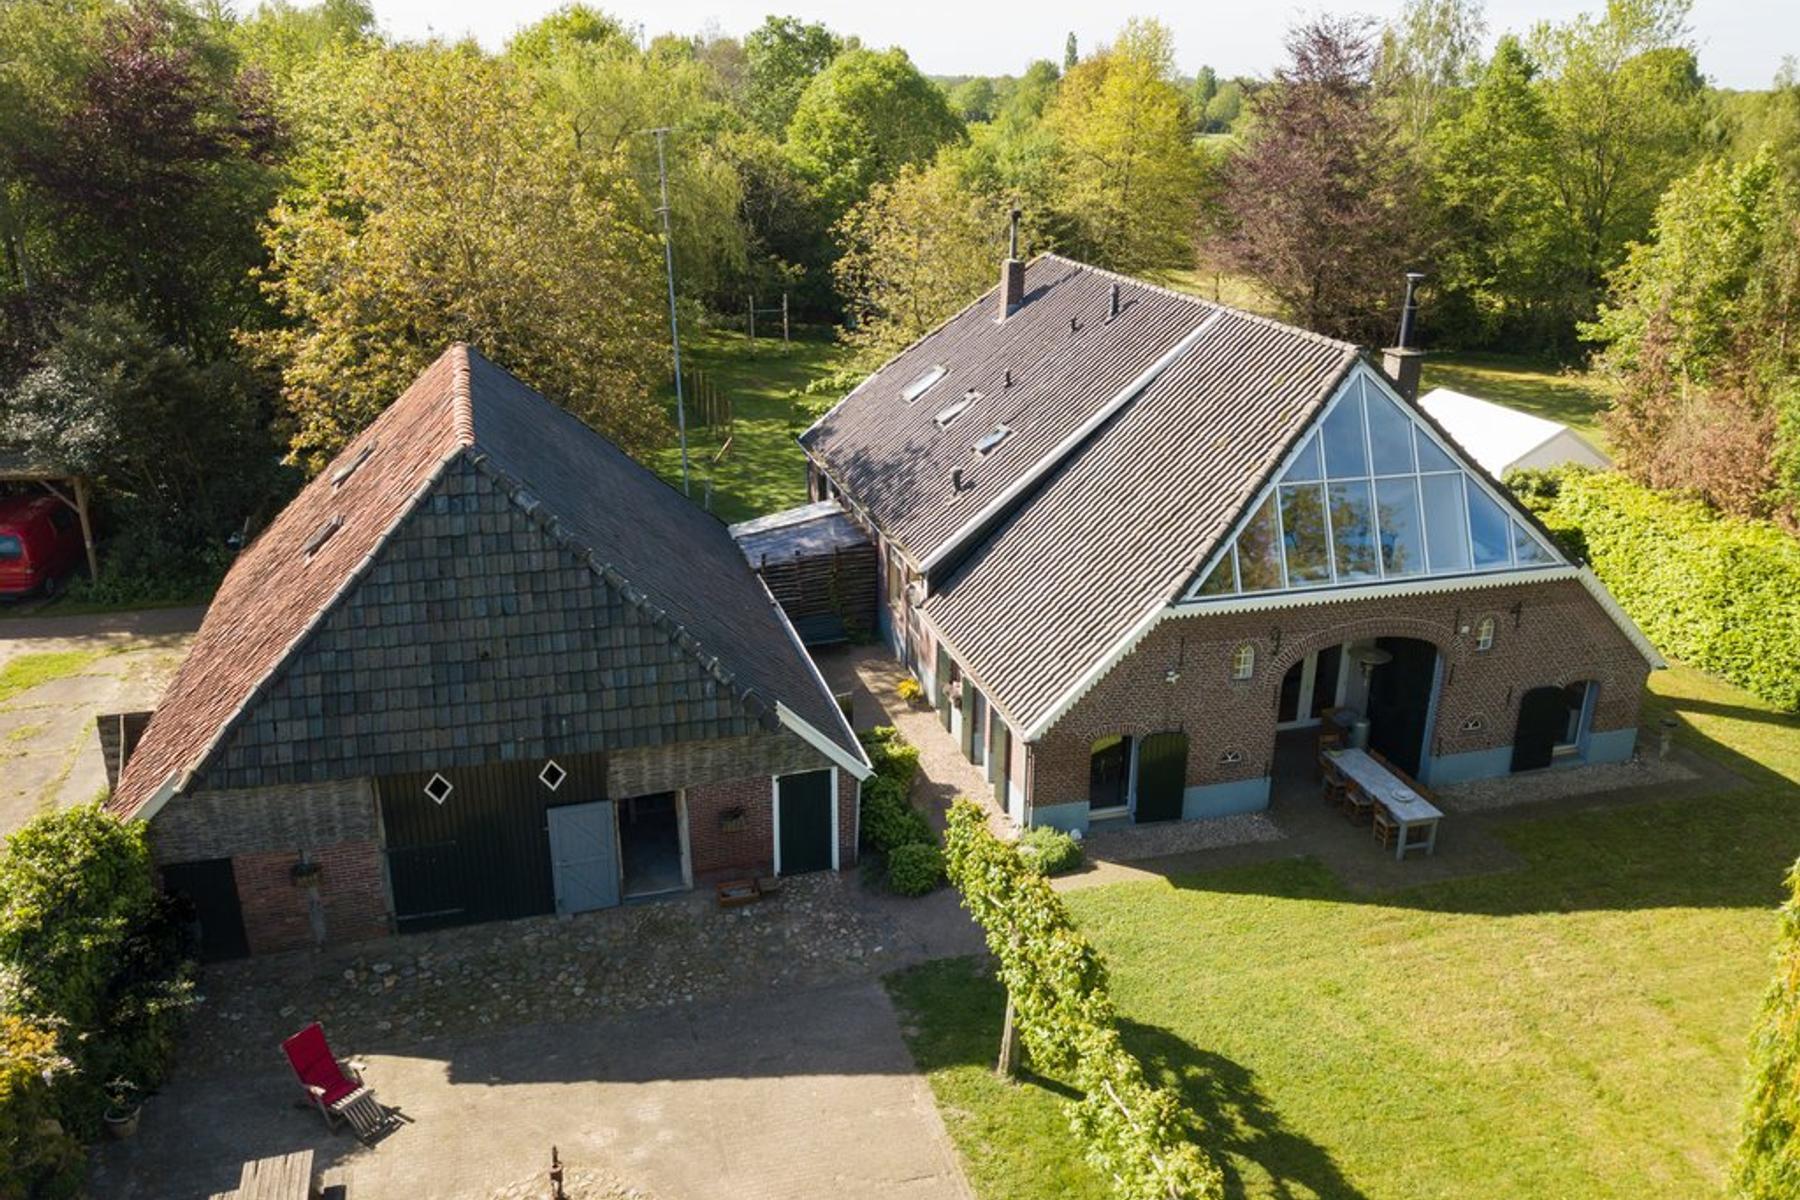 Rector Hulshofstraat 12 A in Harreveld 7135 TV